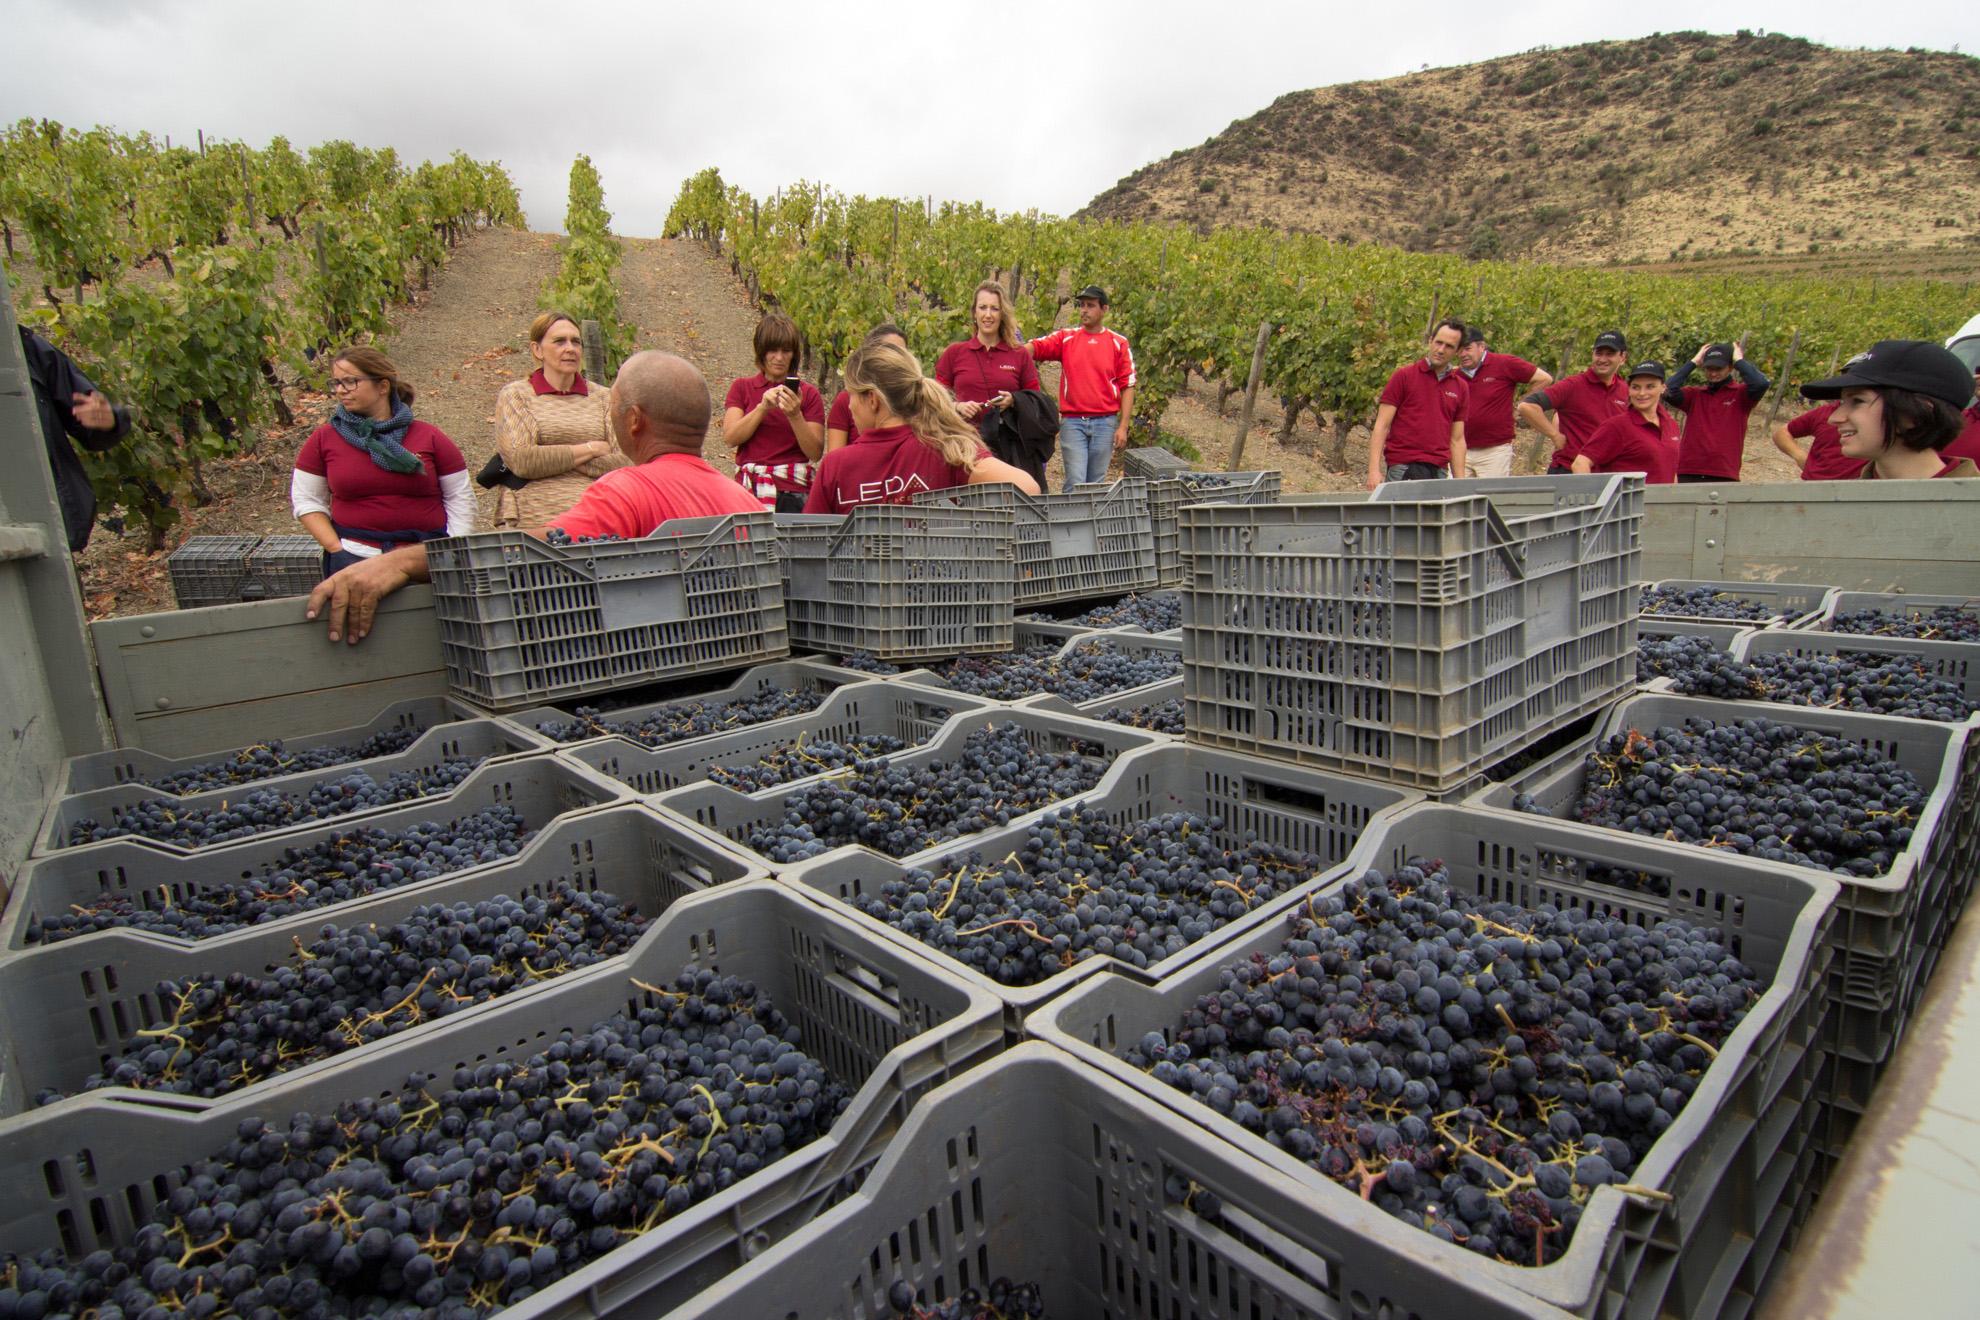 Portugal Vineyard Harvest Quinta de Leda